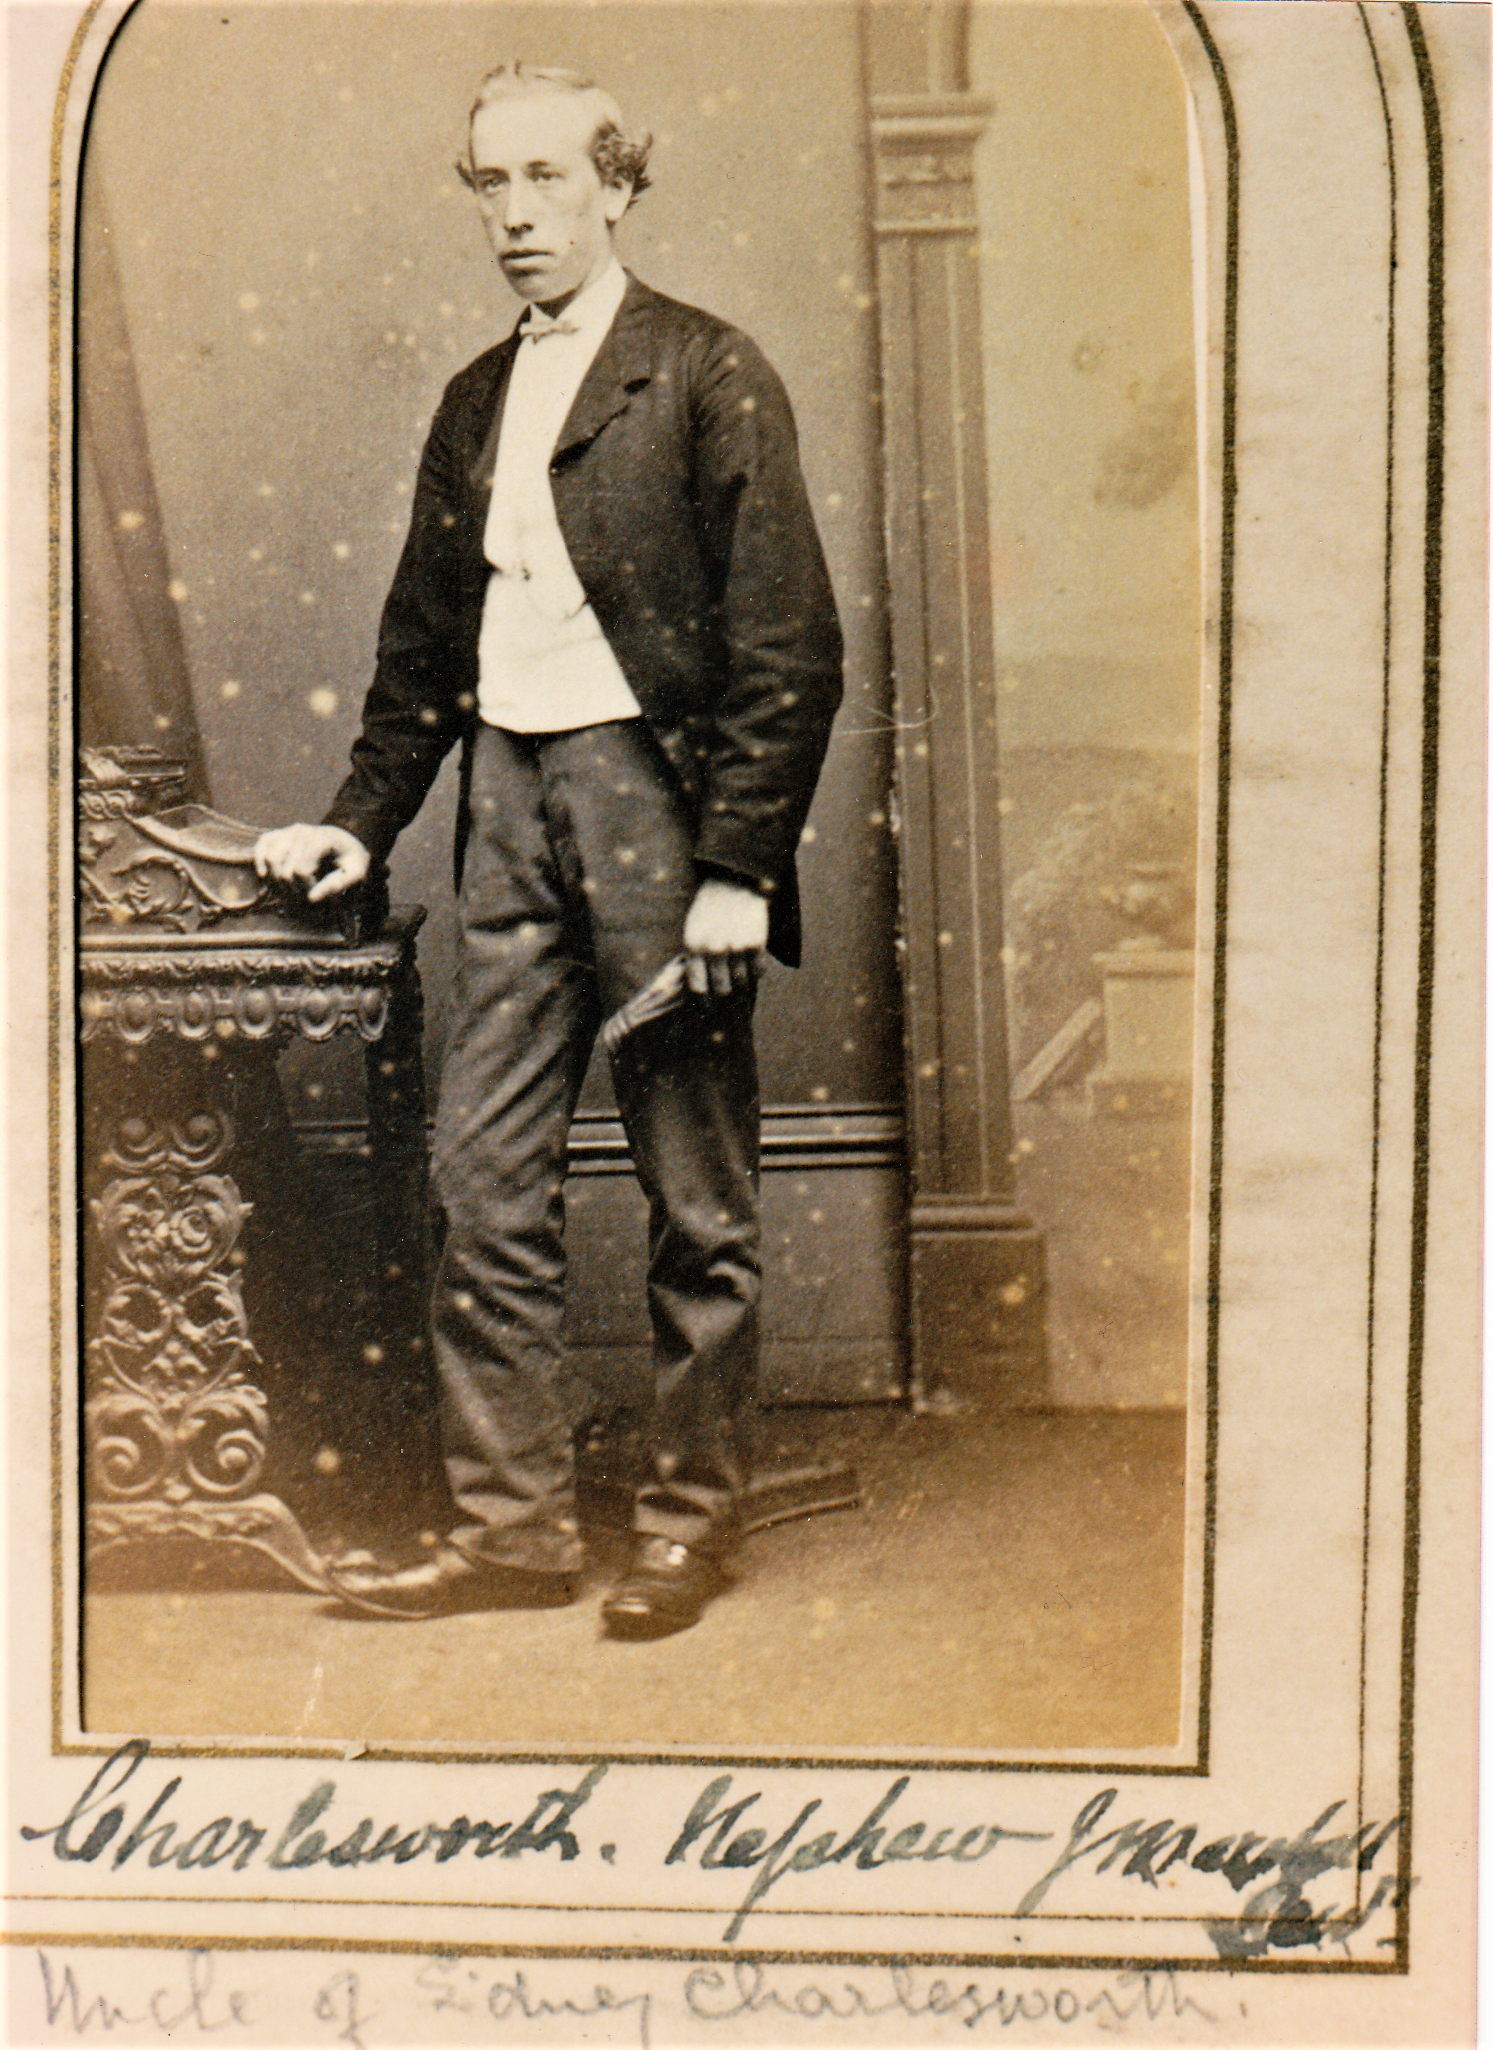 William Charlesworth ( born 1845, married Mary Hannah